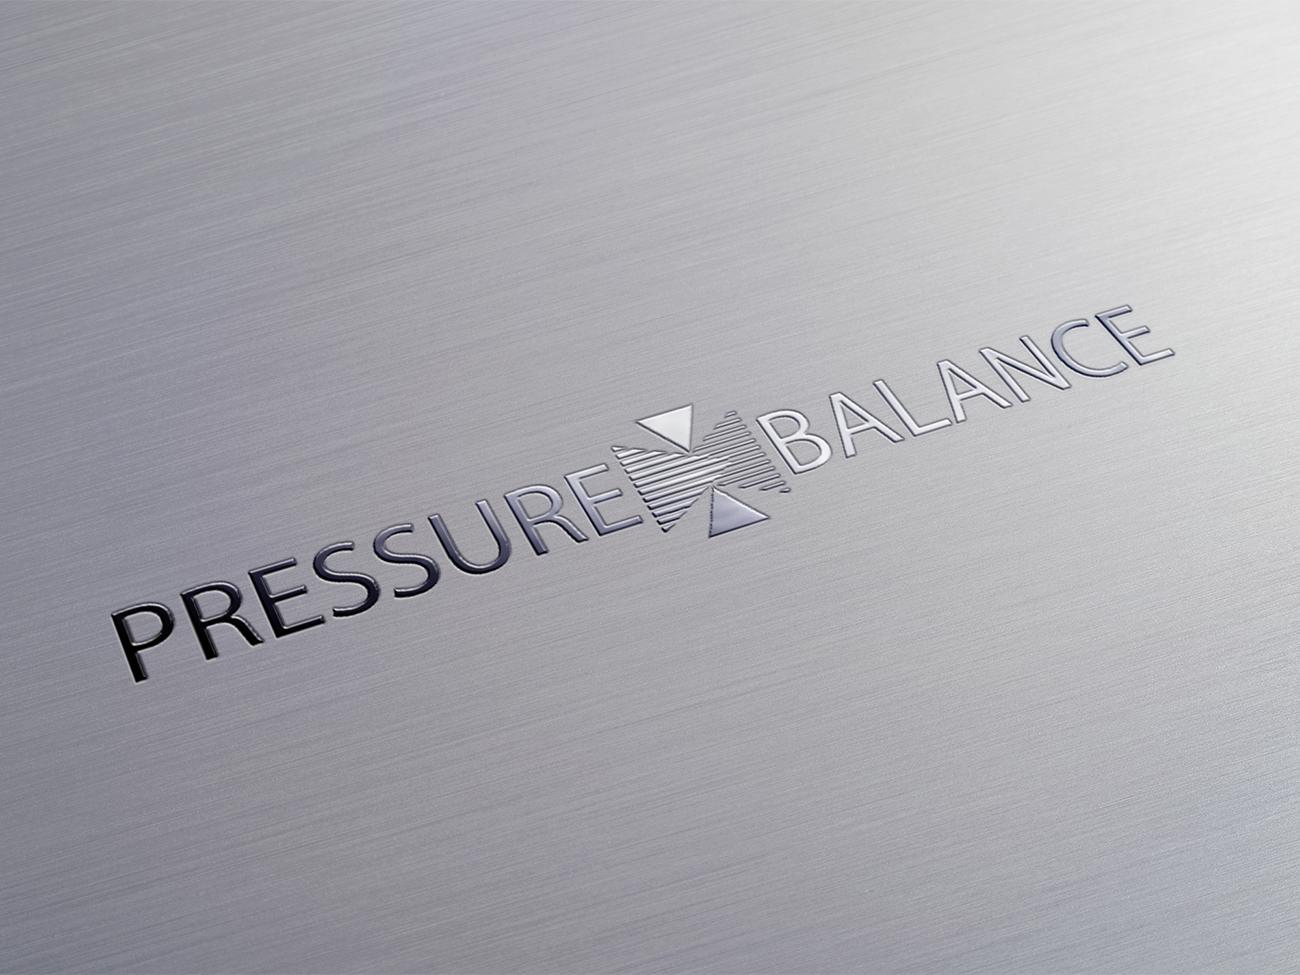 Logo Pressure balance